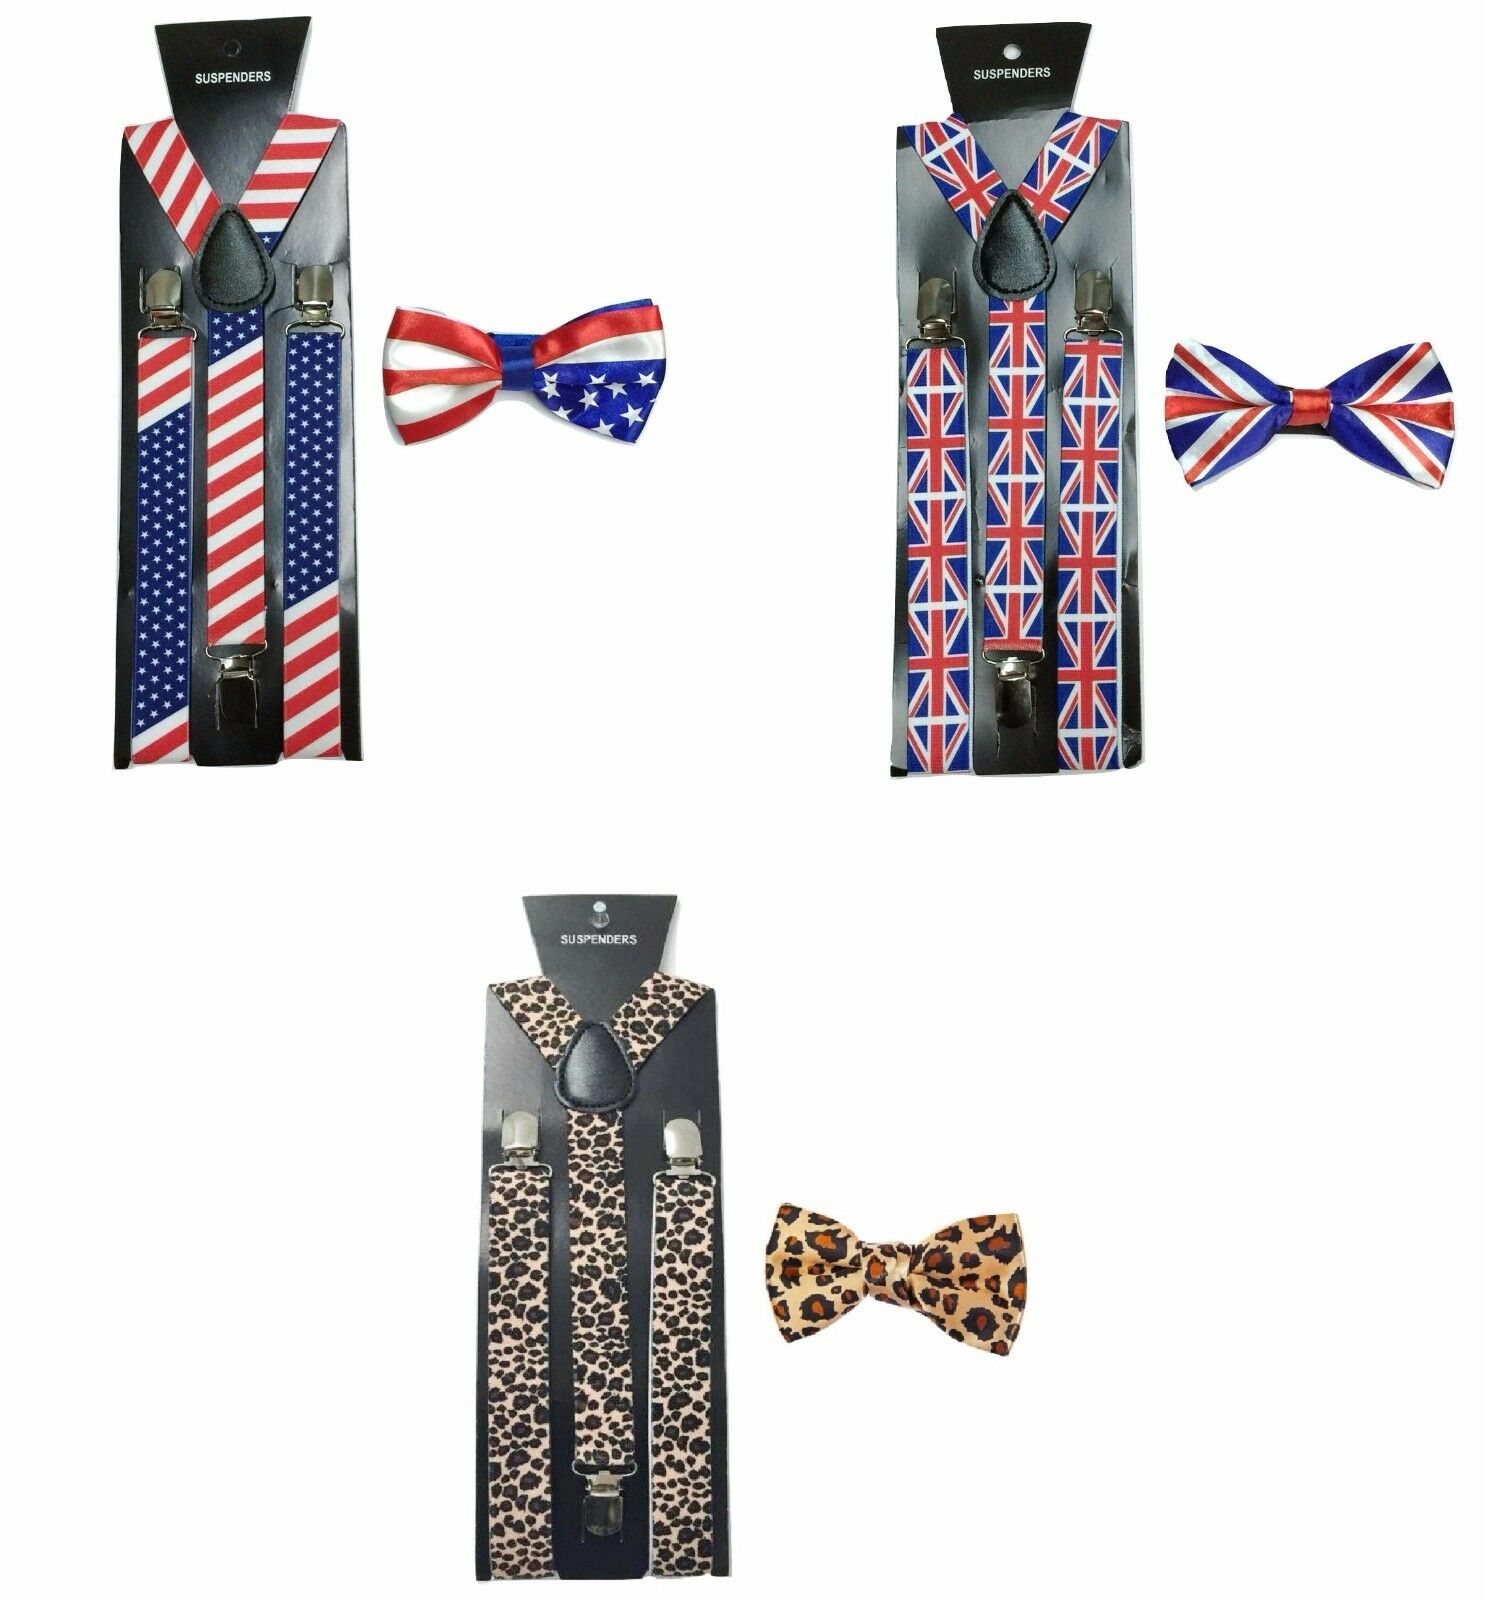 Fliege + Hosenträger Satz American UK Flagge Union Jack Leopard